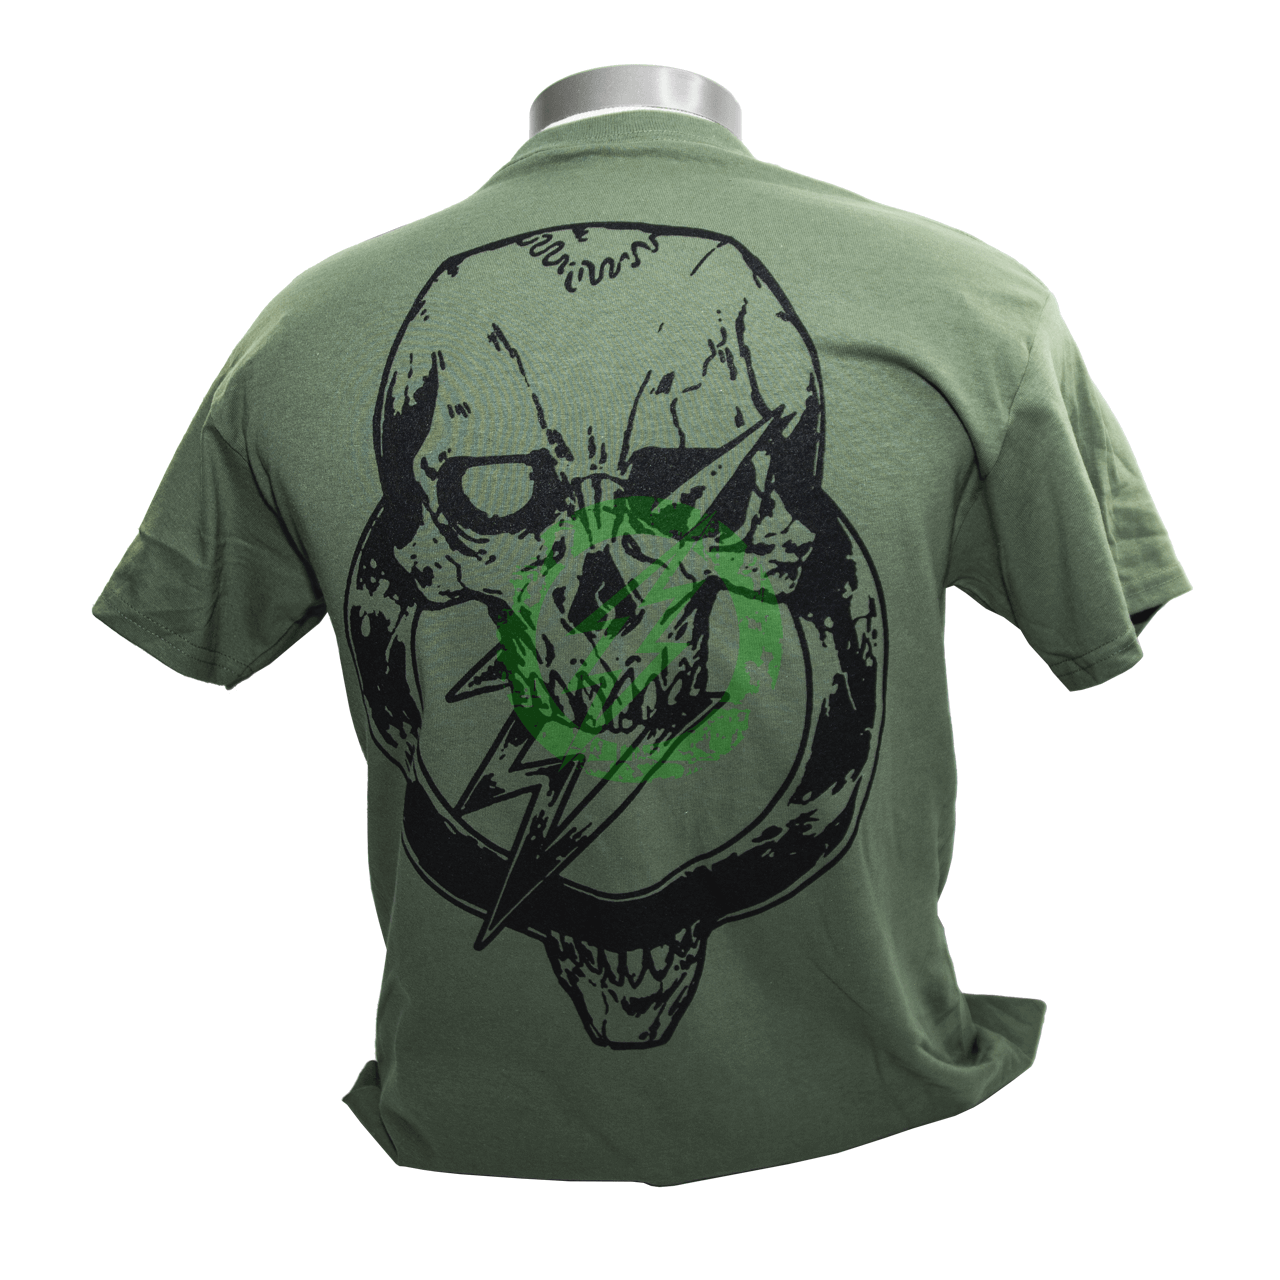 Amped Airsoft T-Shirt Skull Bolt   Olive Drab Back